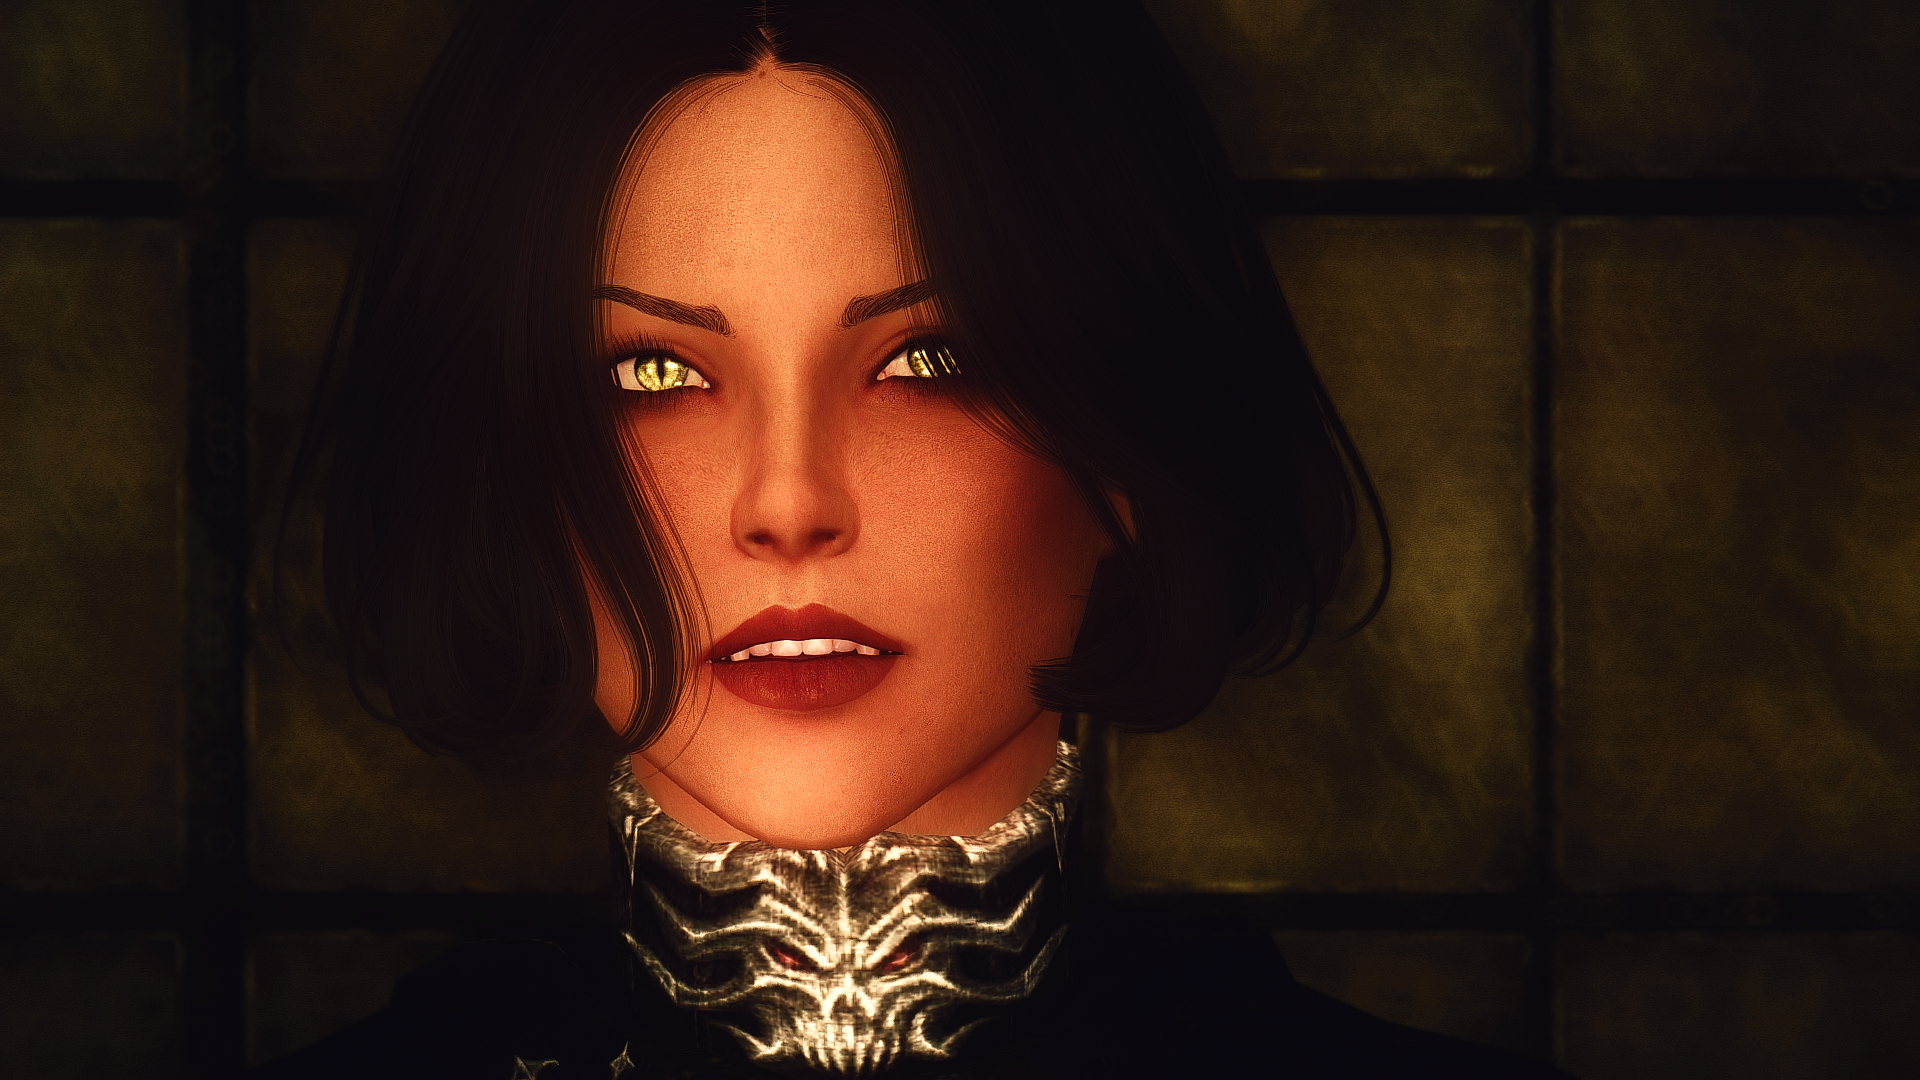 SeRana | I_Sack_Newton :D | Skyrim nexus mods, Eye texture